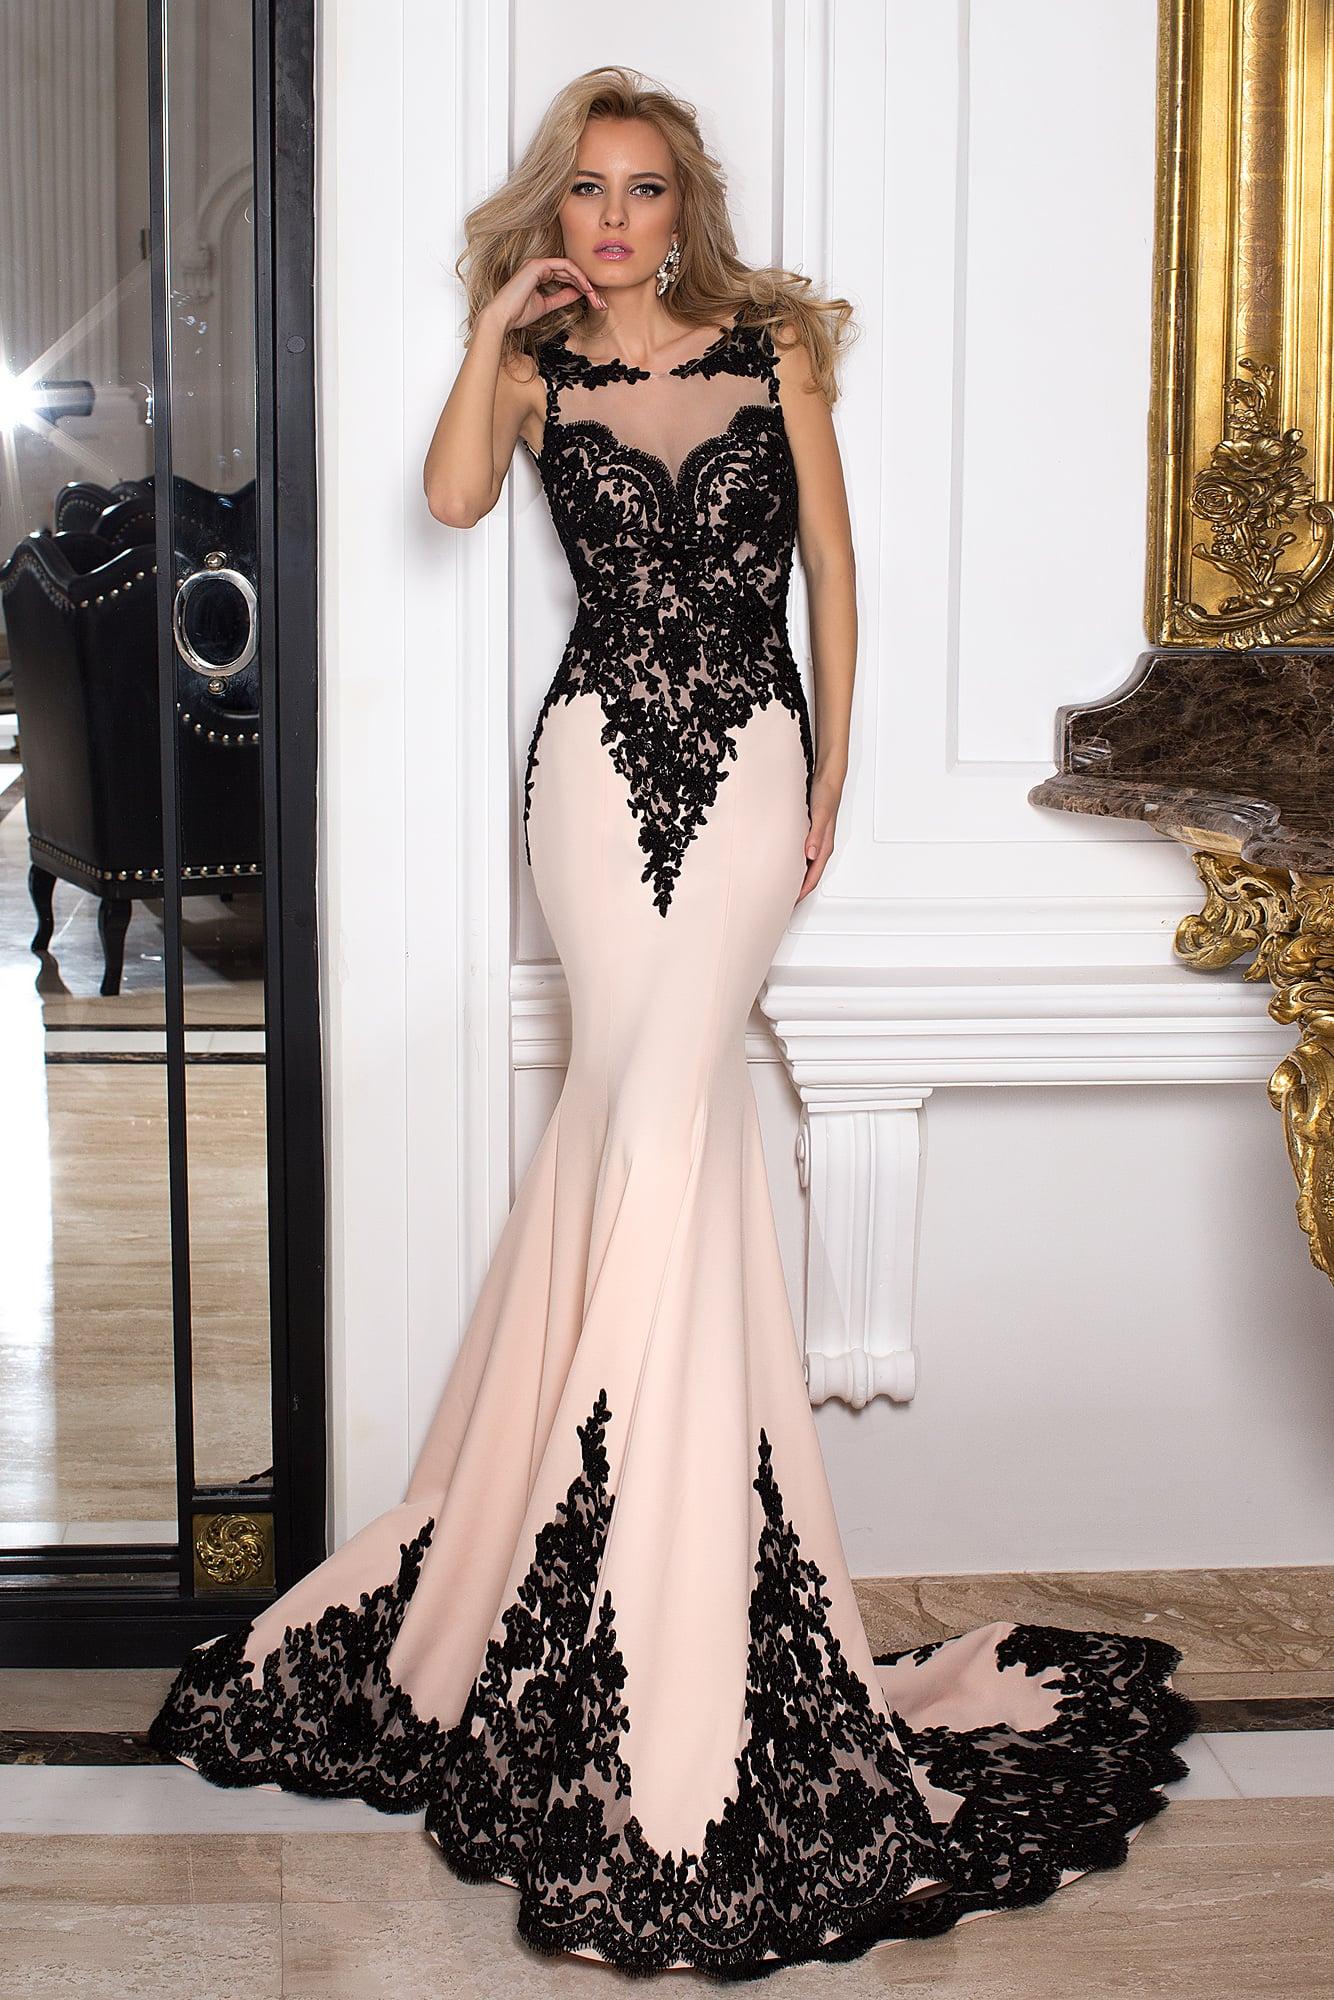 1e7938d65f1 Вечернее платье Oksana Mukha 16-1029. Купить вечернее платье в ...